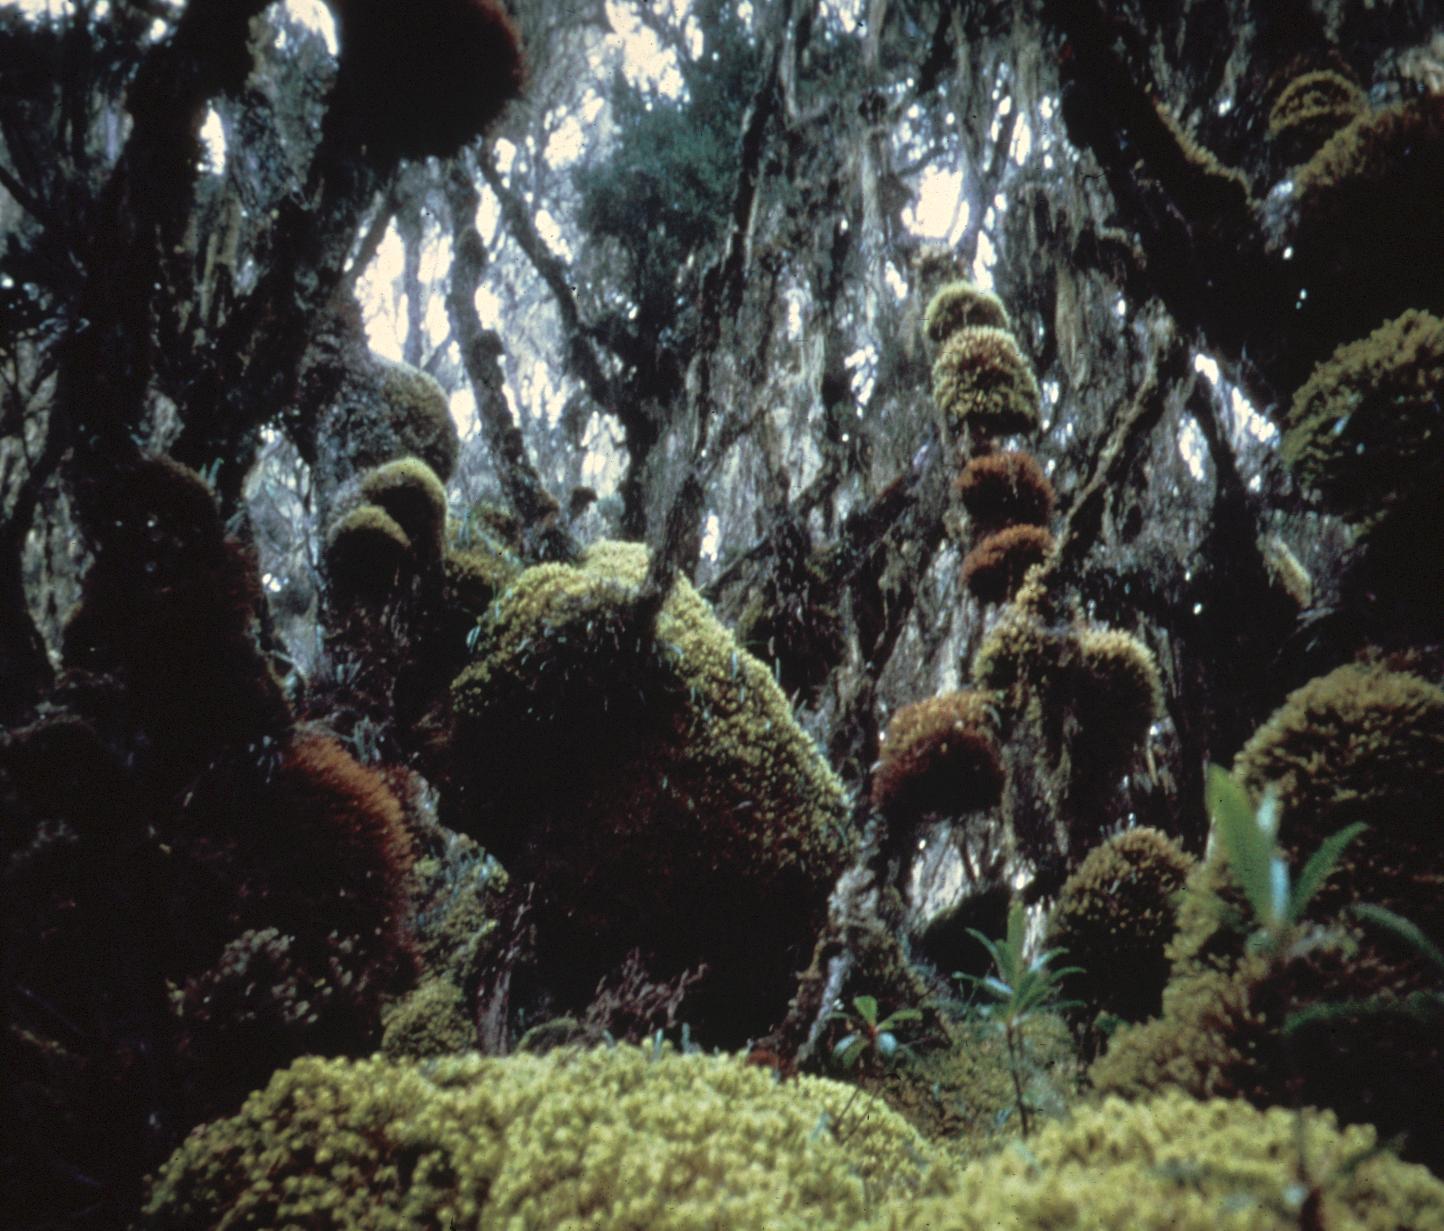 Tropical Vegetation in Ruwenzori Mountains